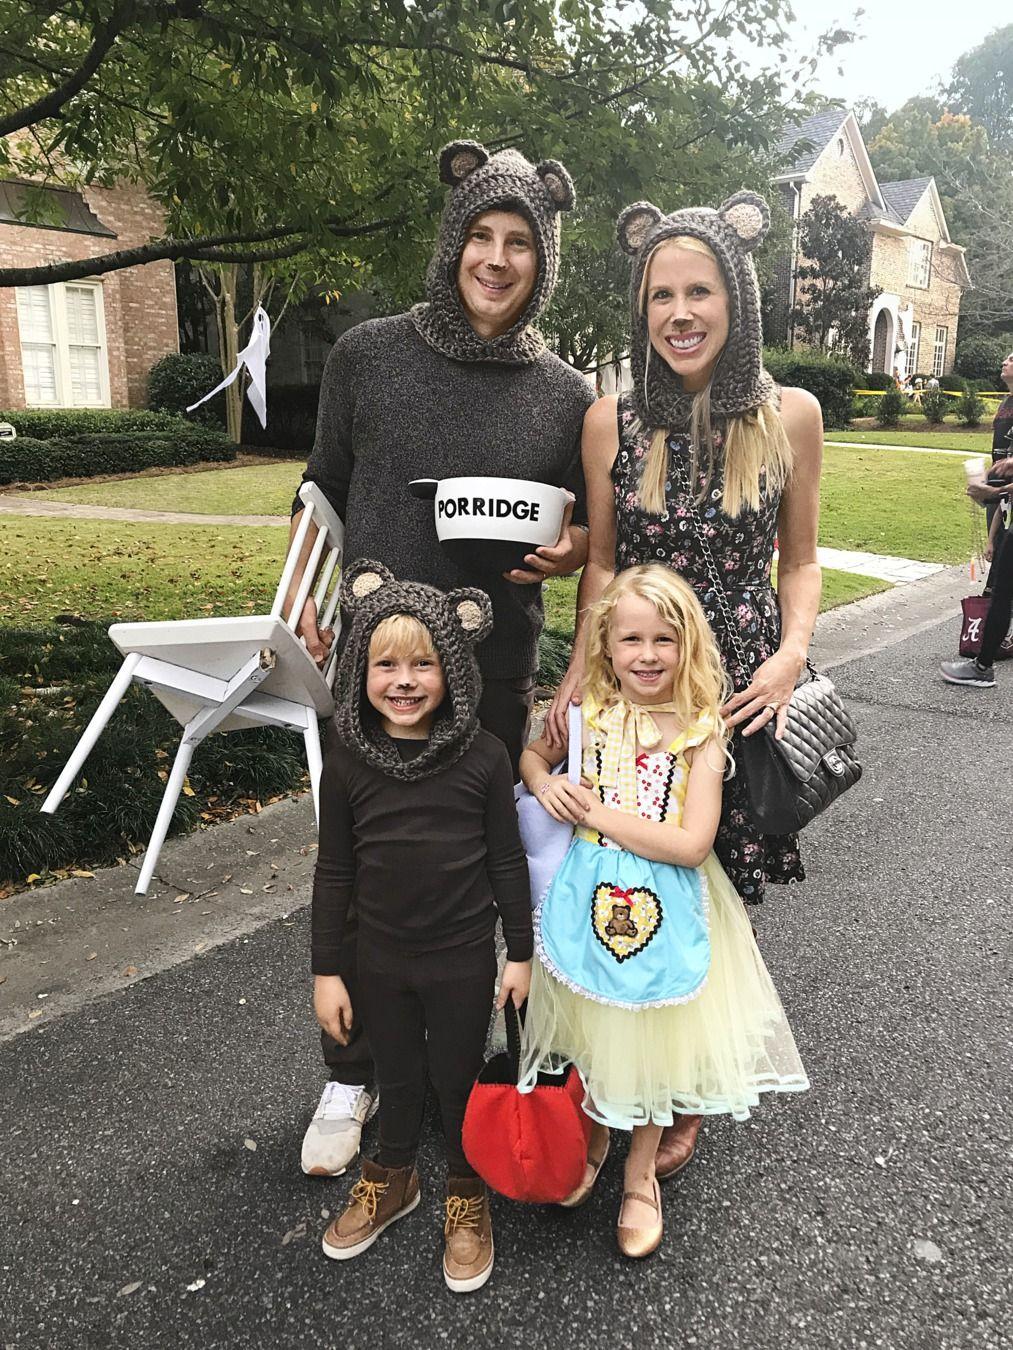 31 Best Family Halloween Costume Ideas 2020 Family Of 3 Halloween Costume Ideas